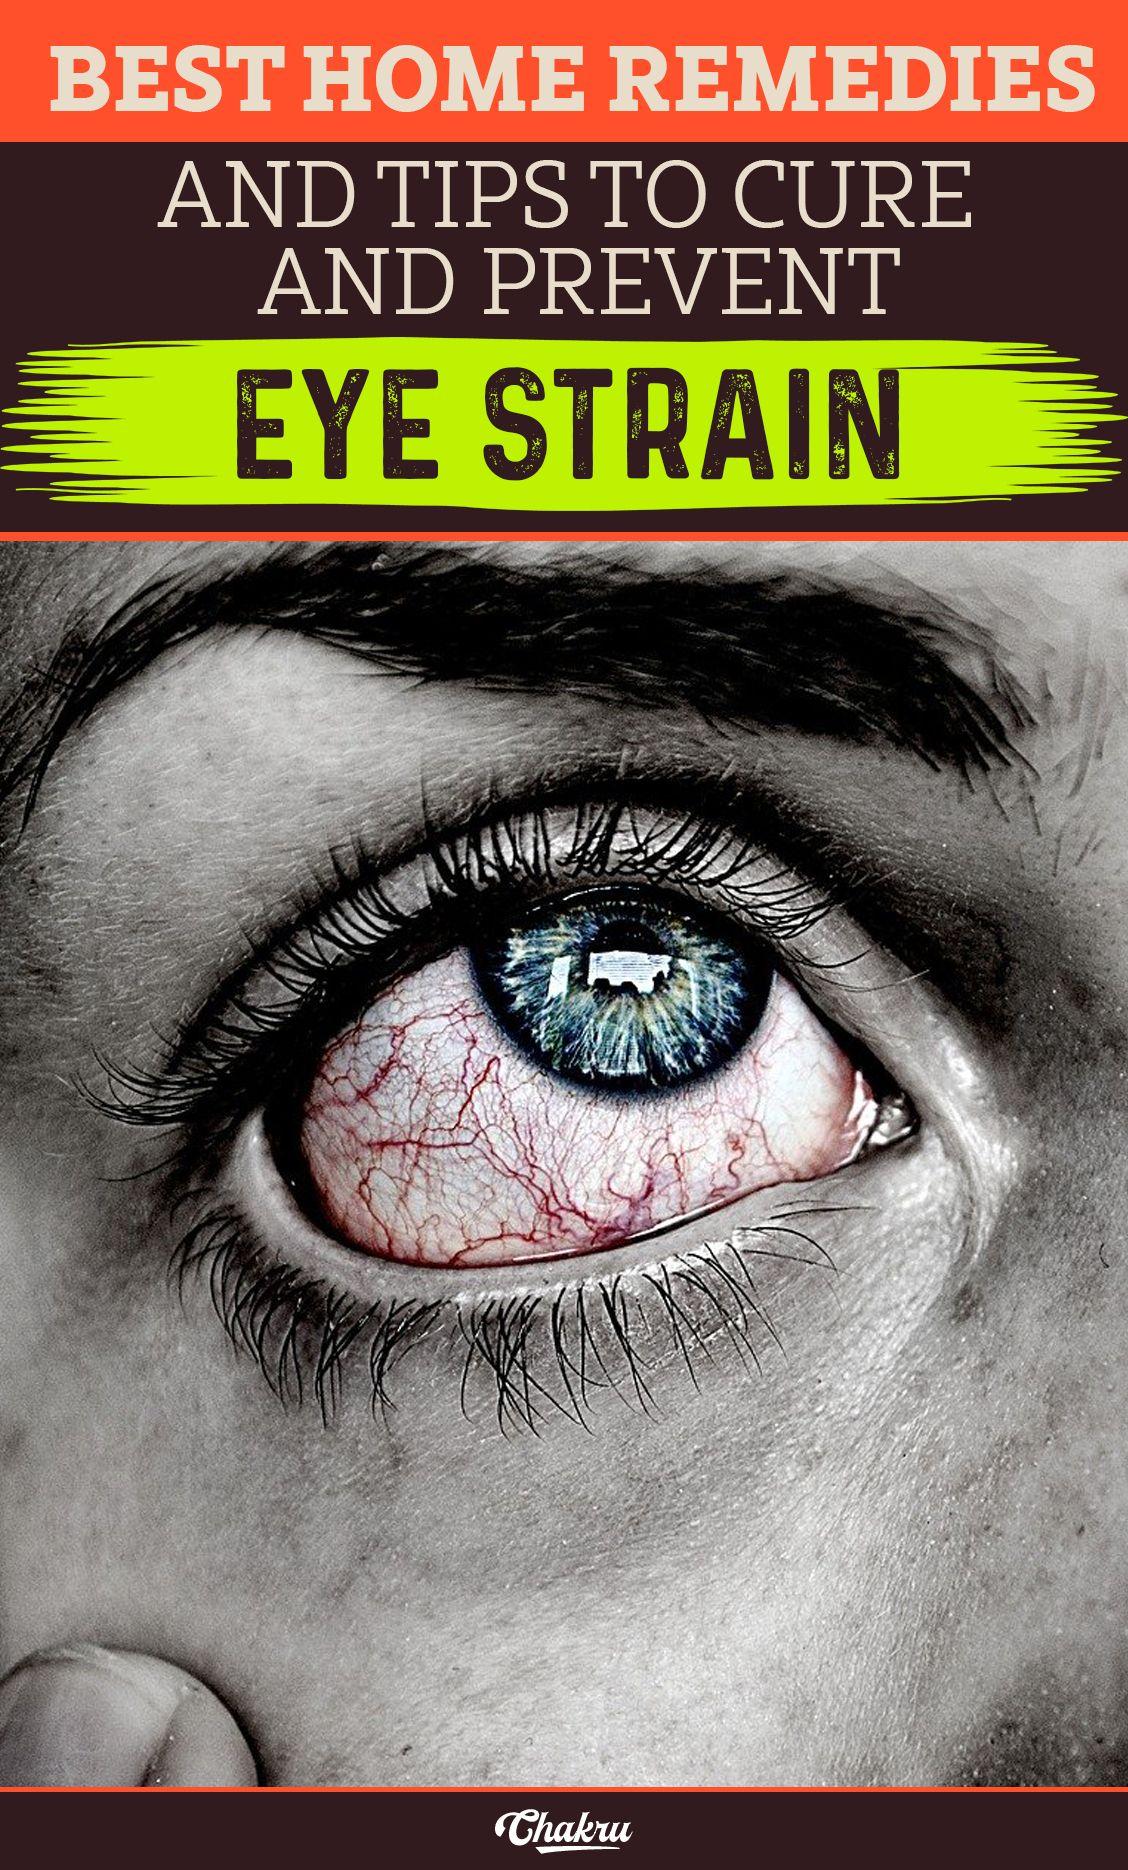 25042b40d59789646b421db7e94f3156 - How To Get Rid Of Eye Strain Home Remedies